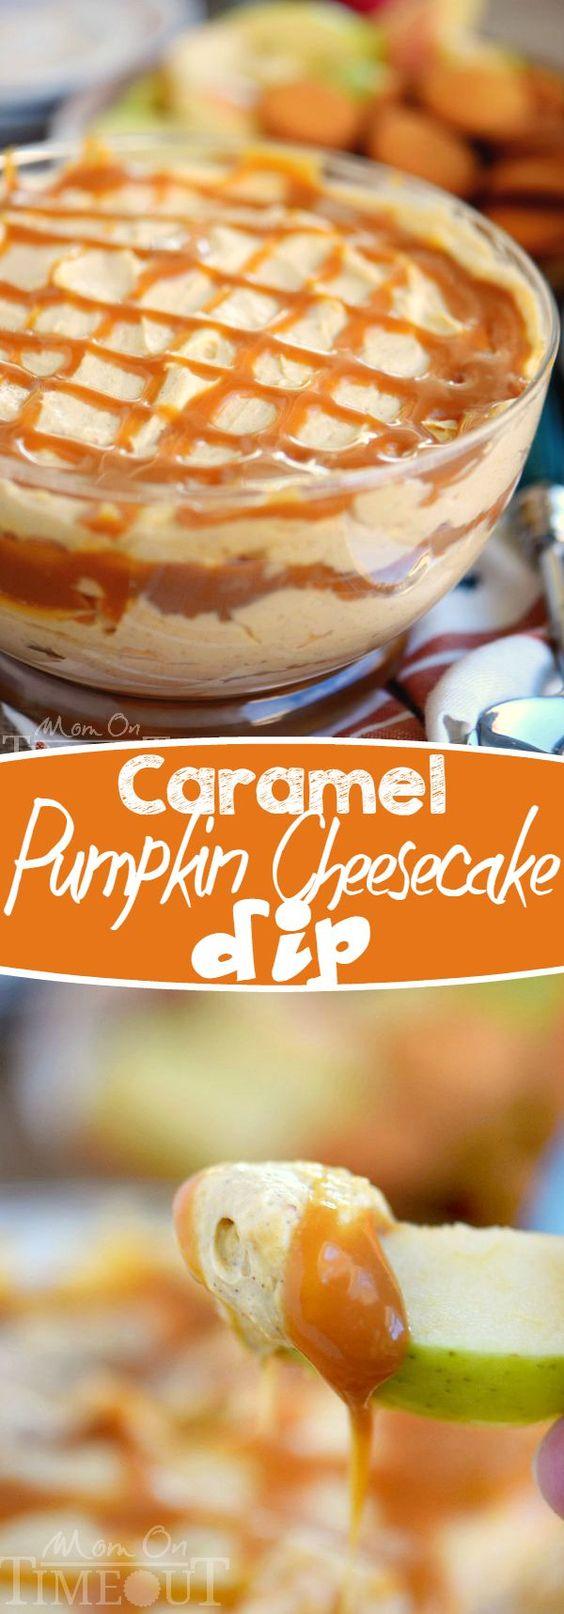 Thanksgiving Desserts: Caramel Pumpkin Cheesecake Dip